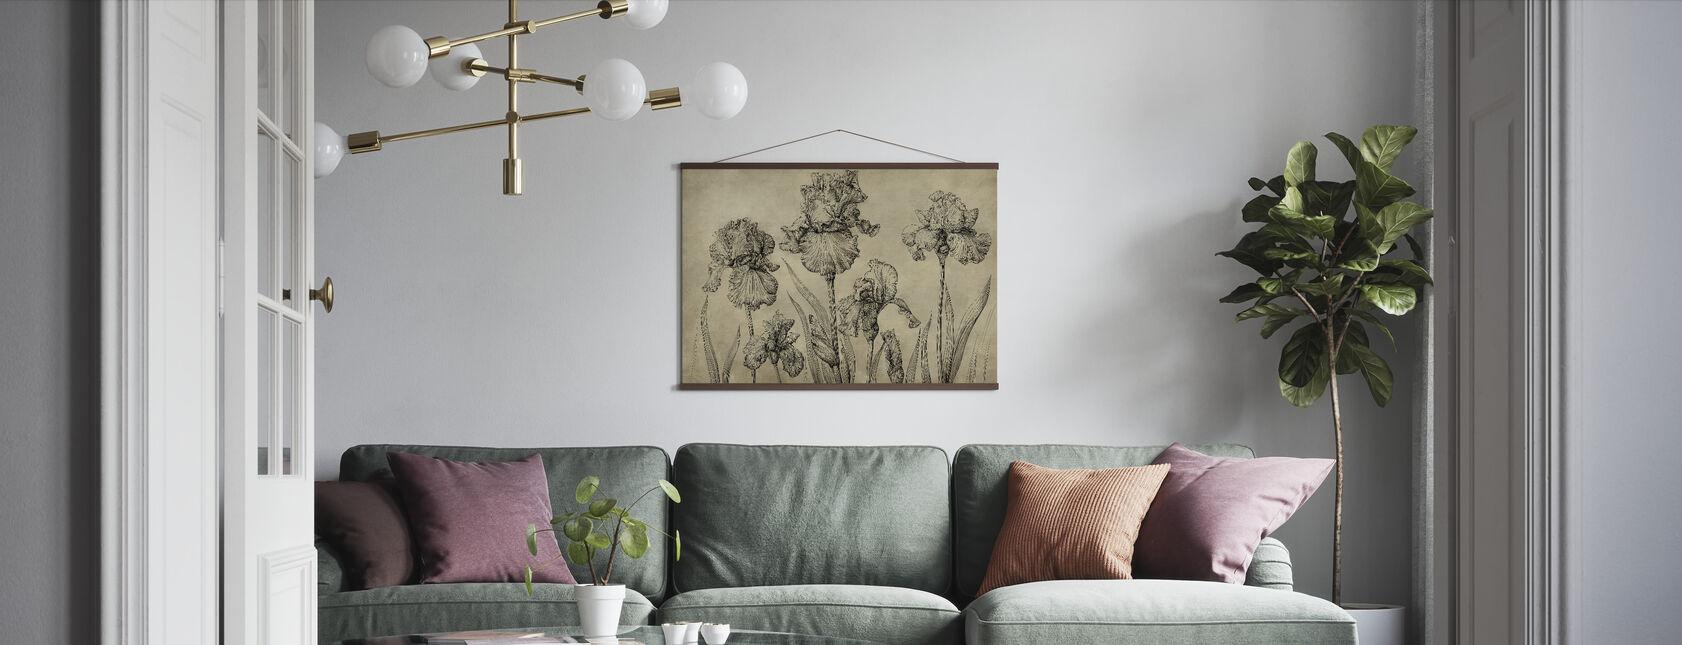 Iris - Vintage Amber - Plakat - Stue